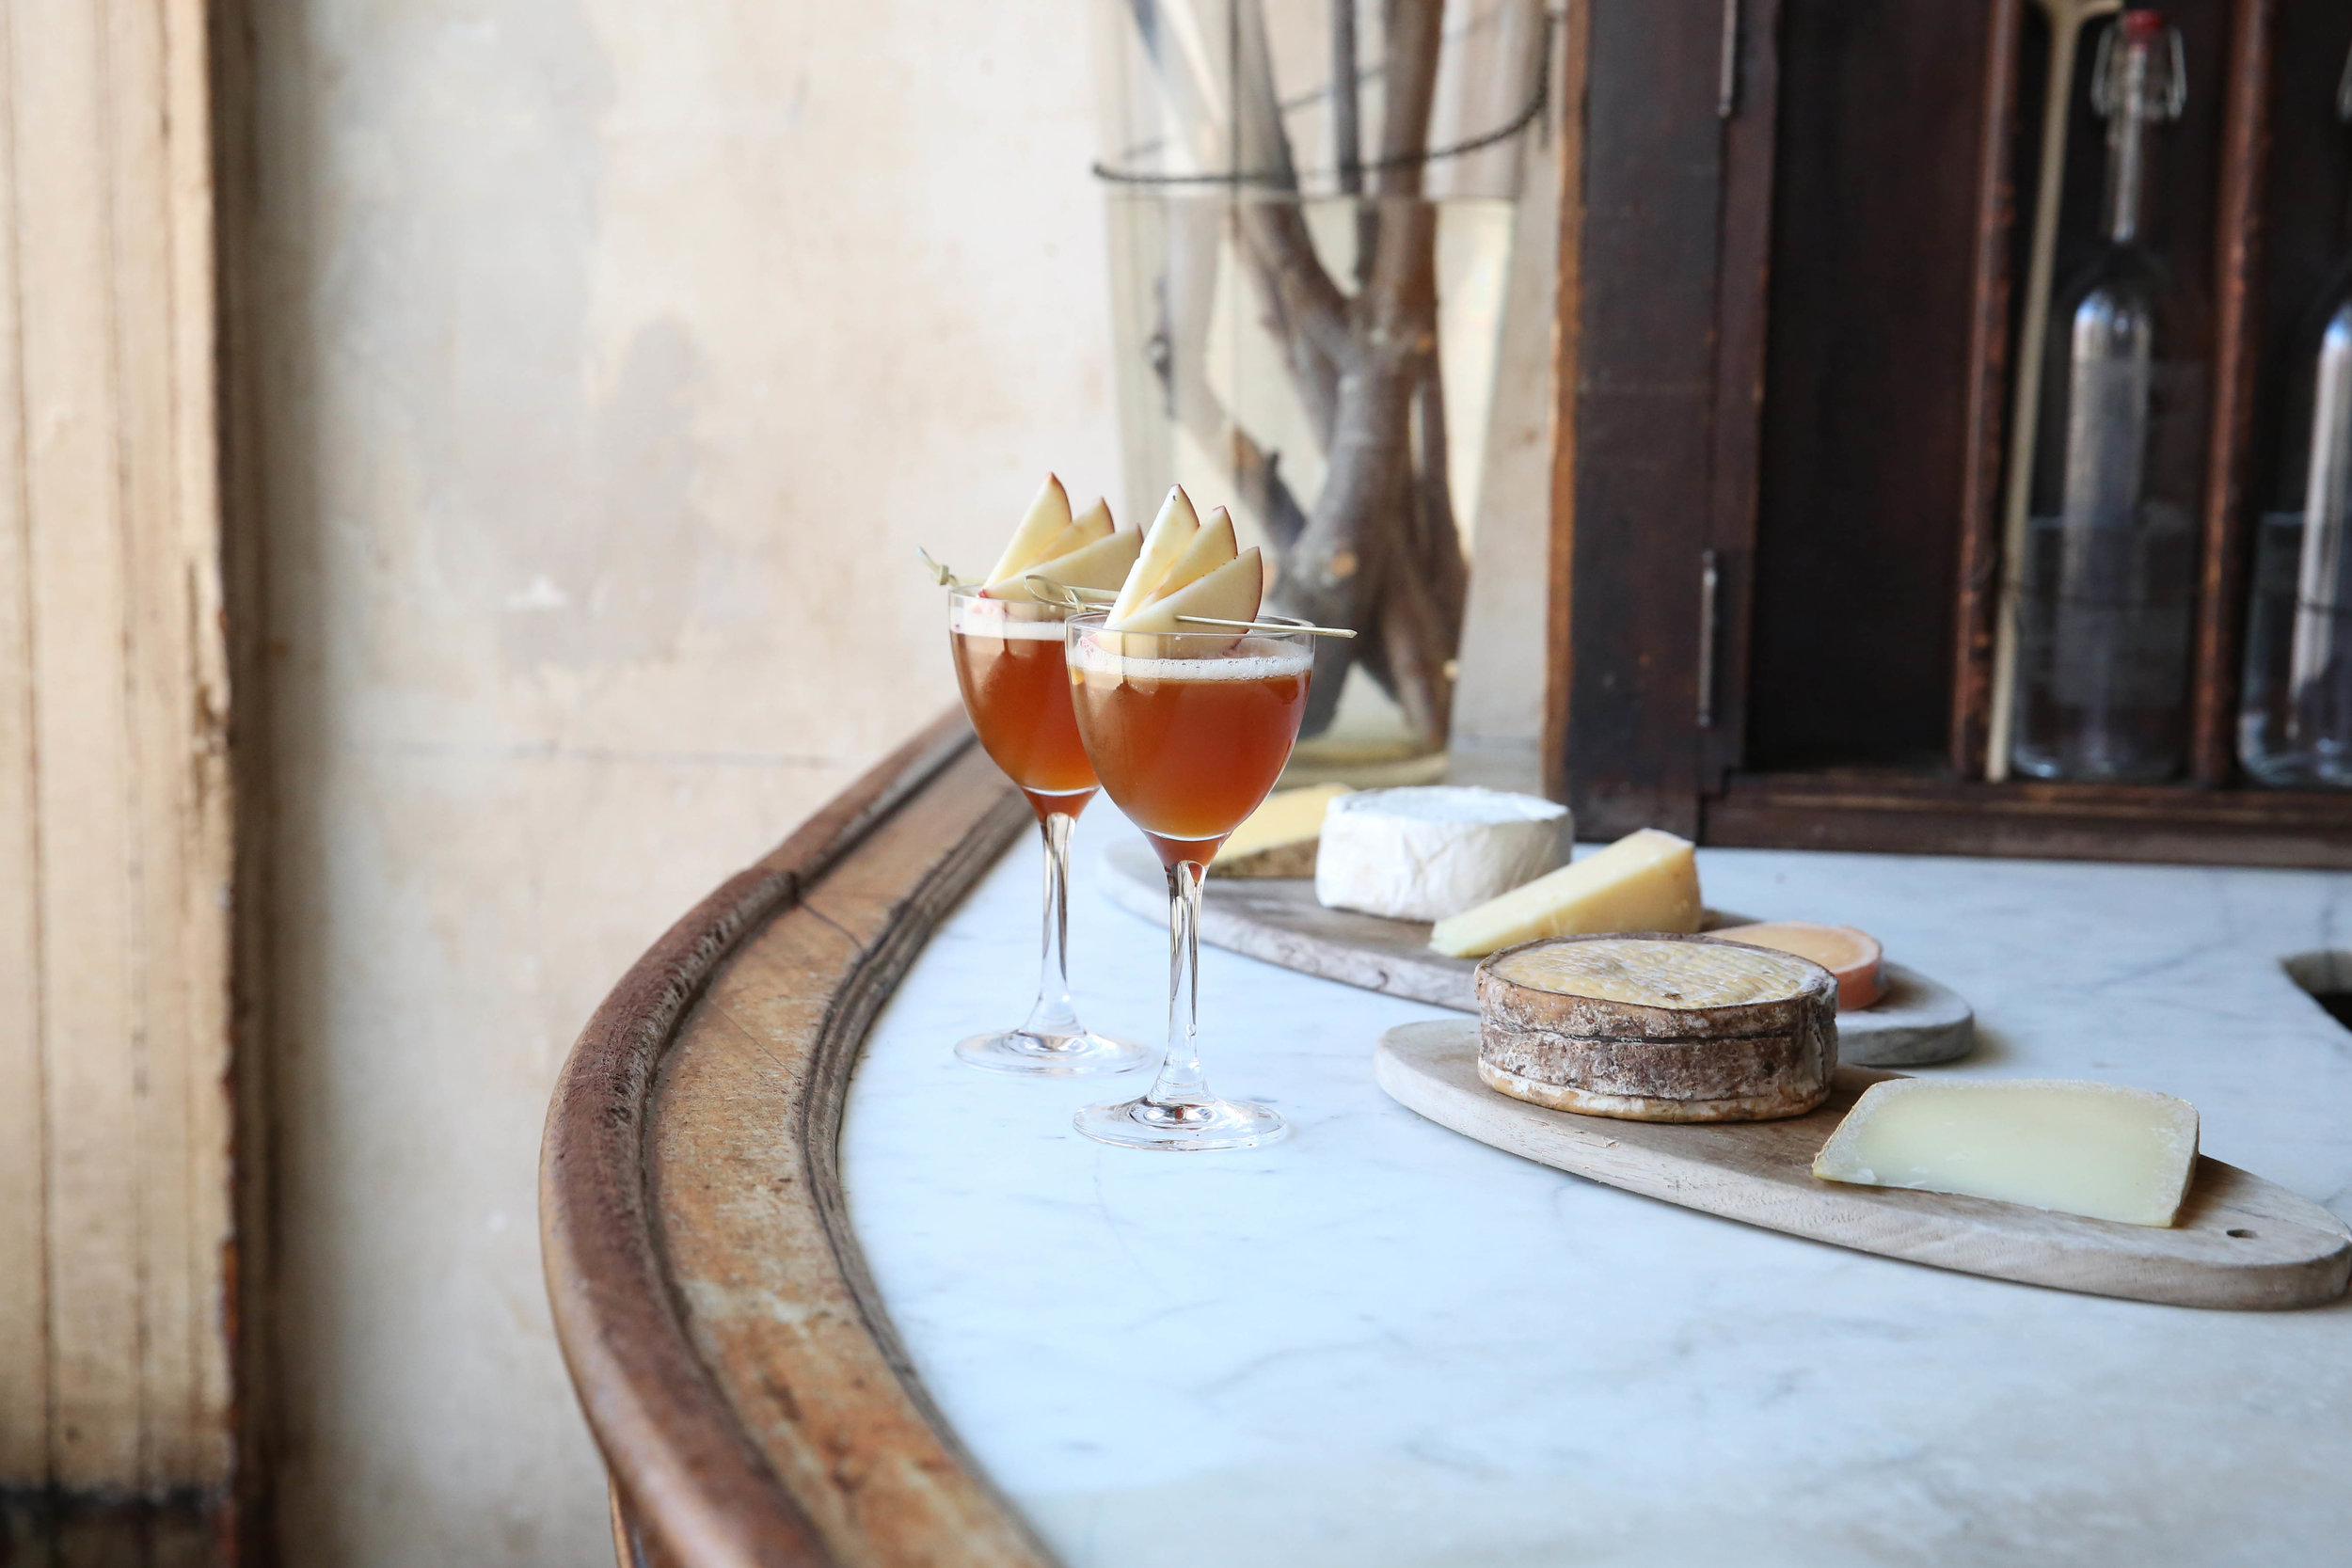 hotel-delmano-cocktail-cheese-pairing-1U9A4983.jpg